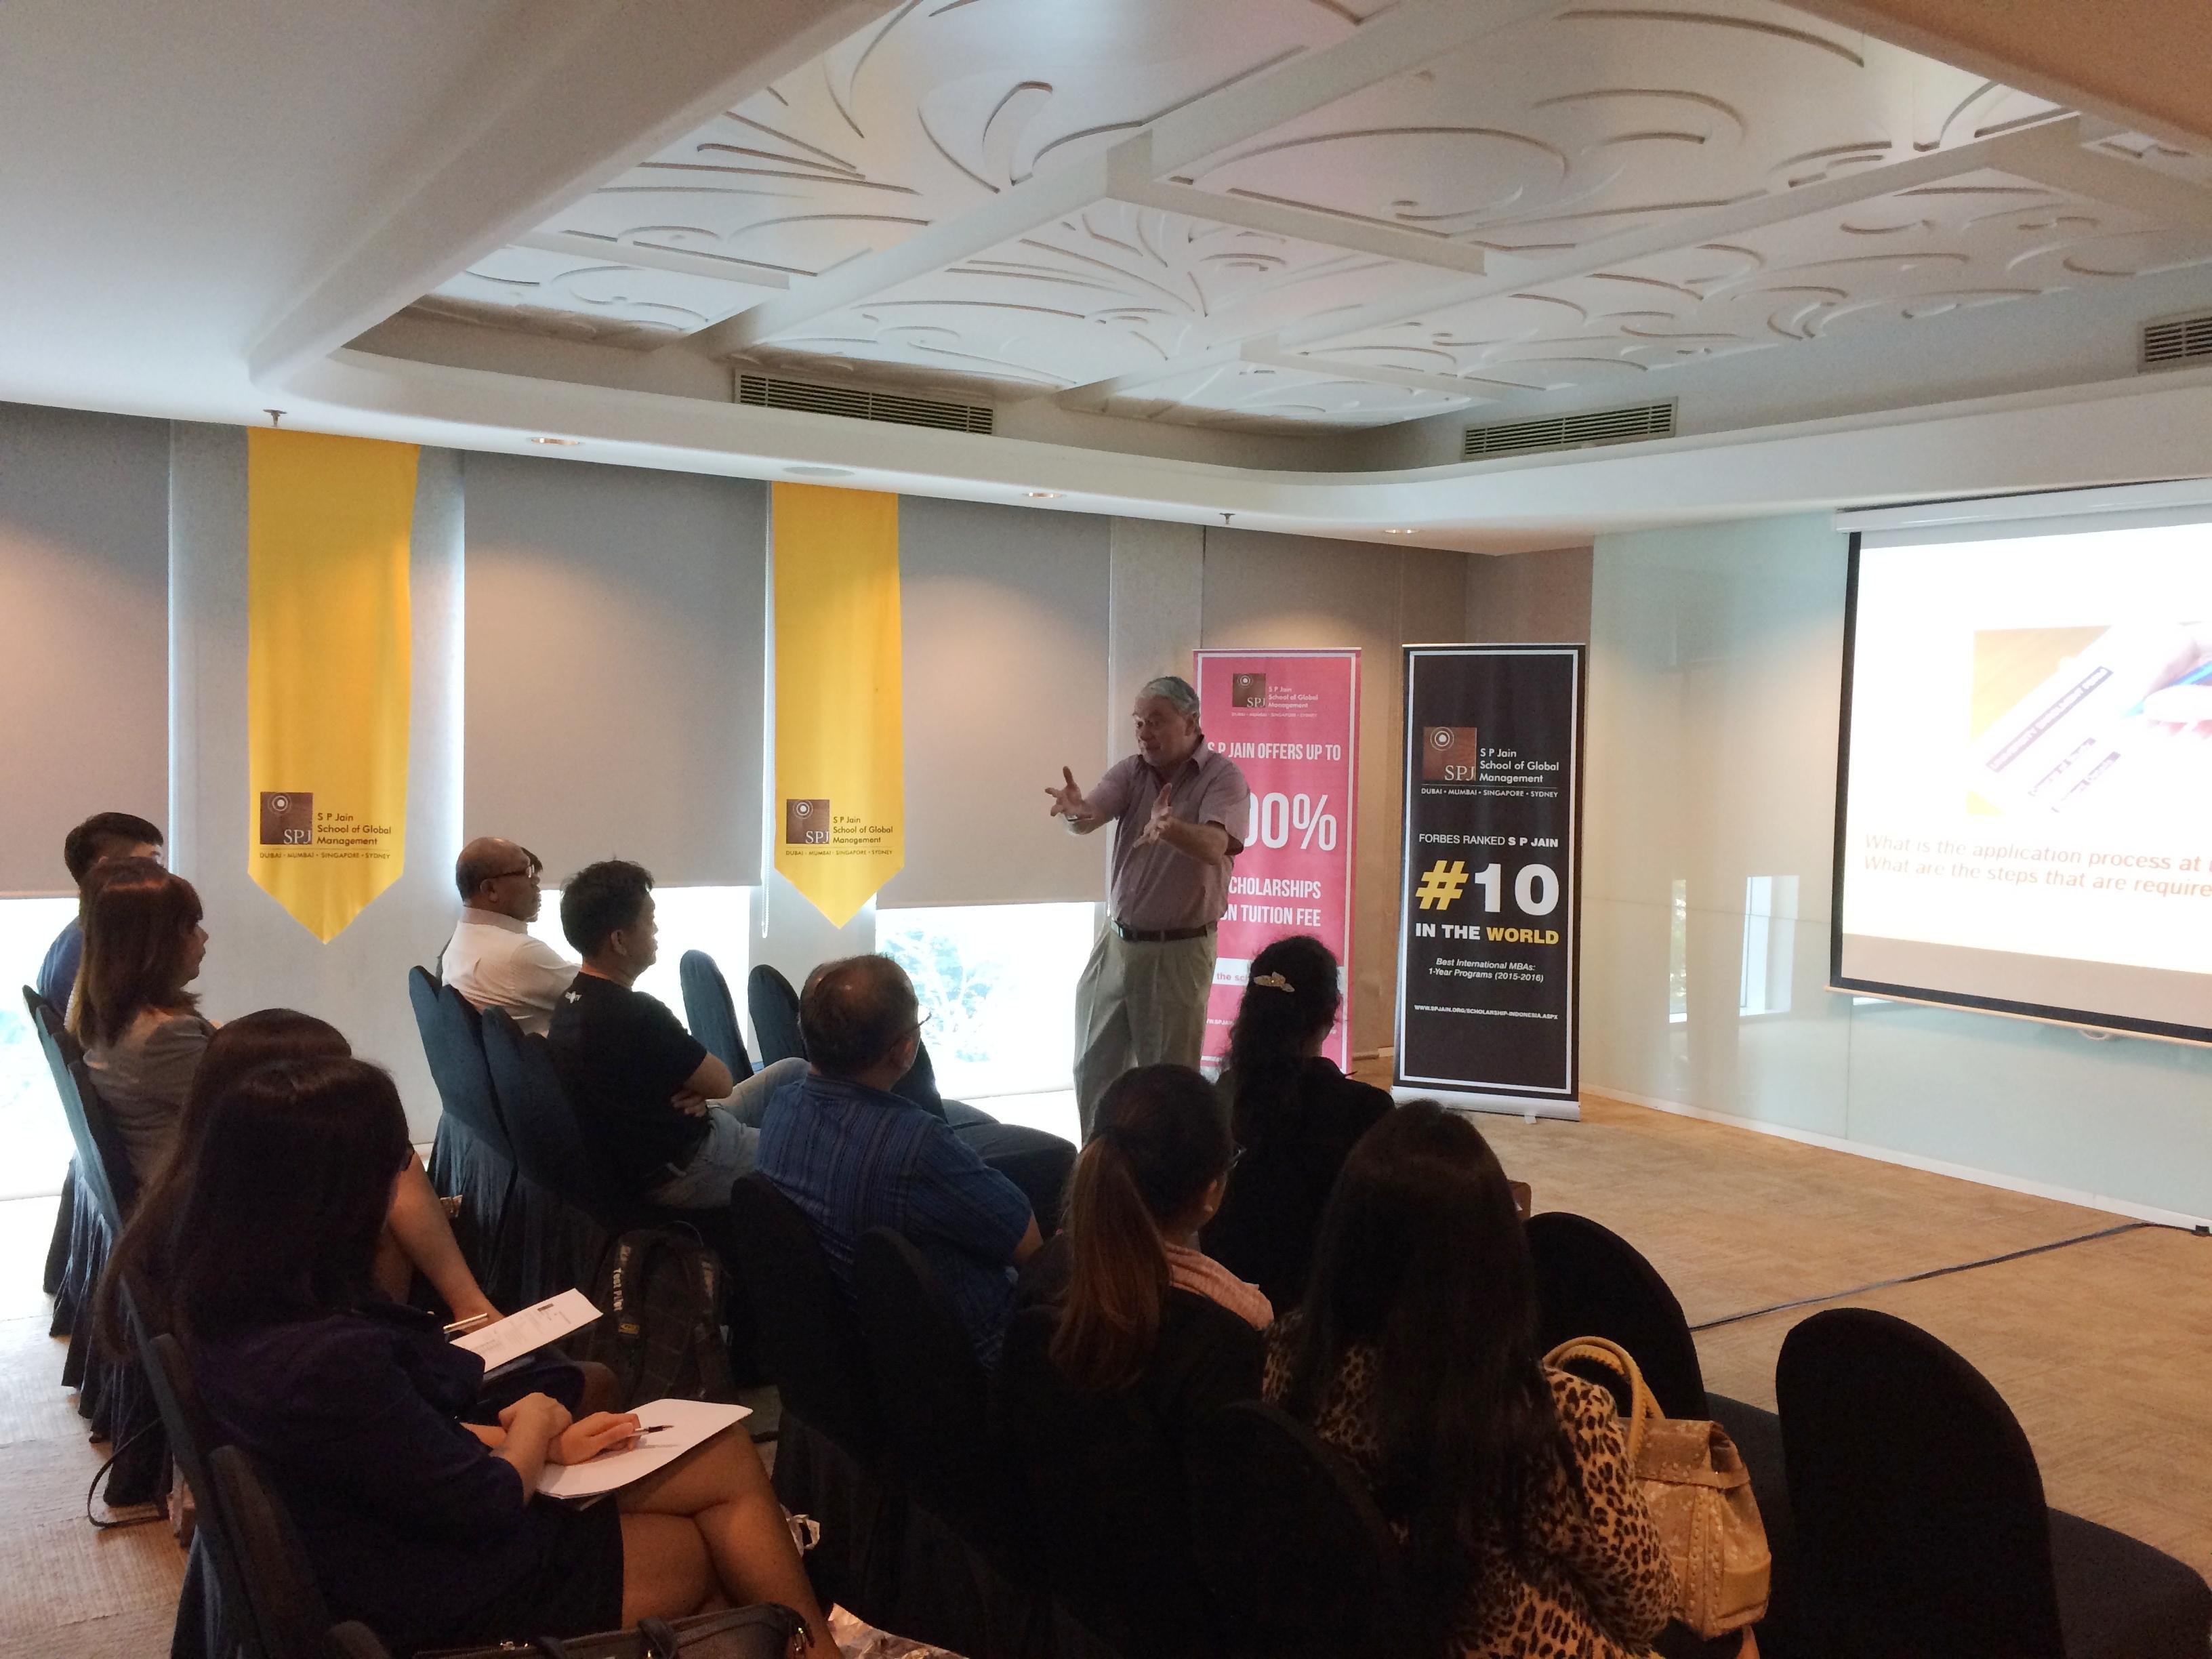 SP Jain School of Global Management—High Tea with the Dean event report